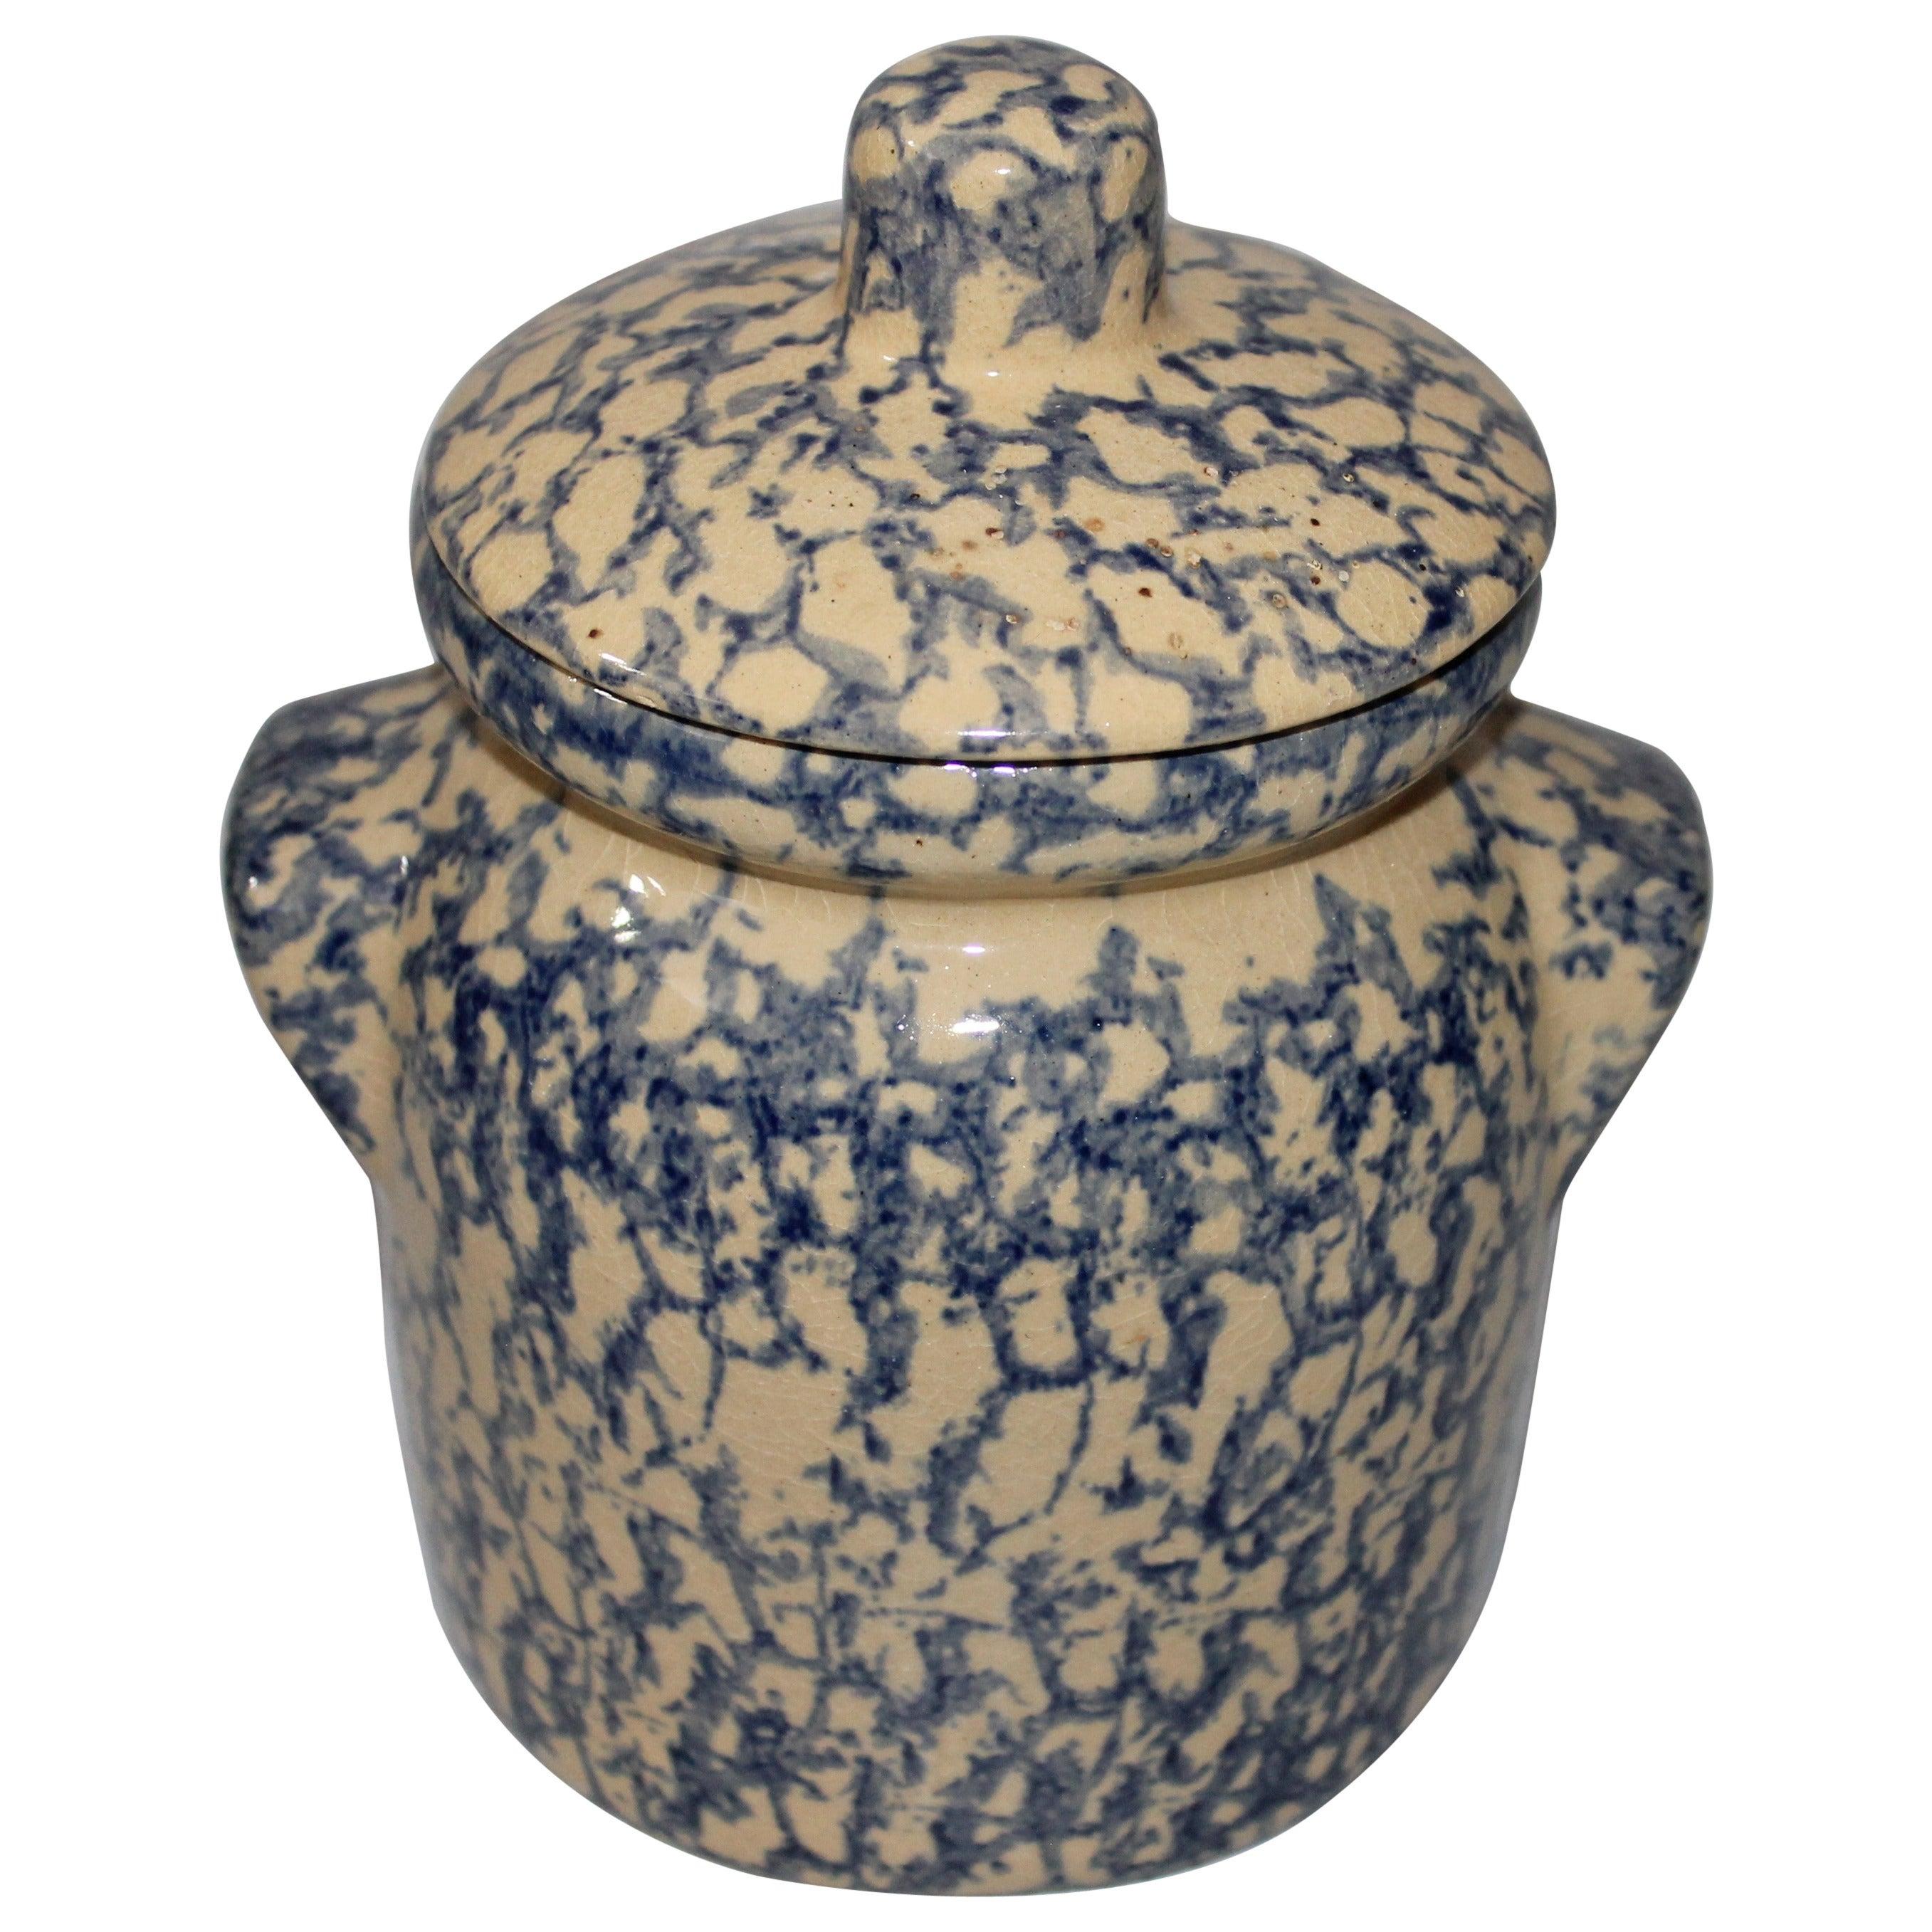 Early 20th Century Spongeware Canister Jar